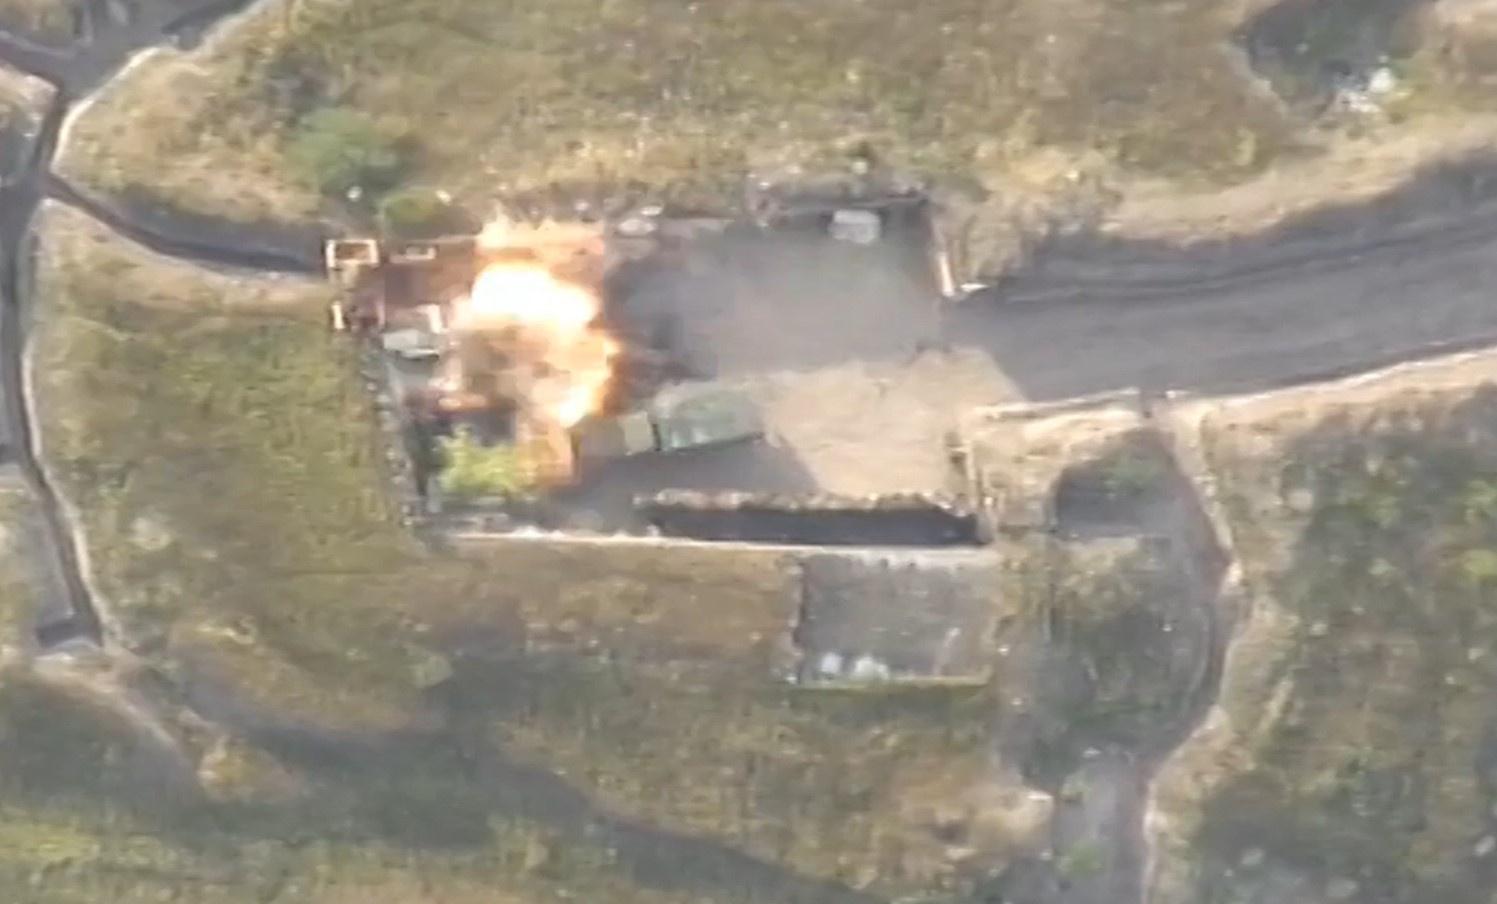 Border fights: Armenia uses heavy equipment